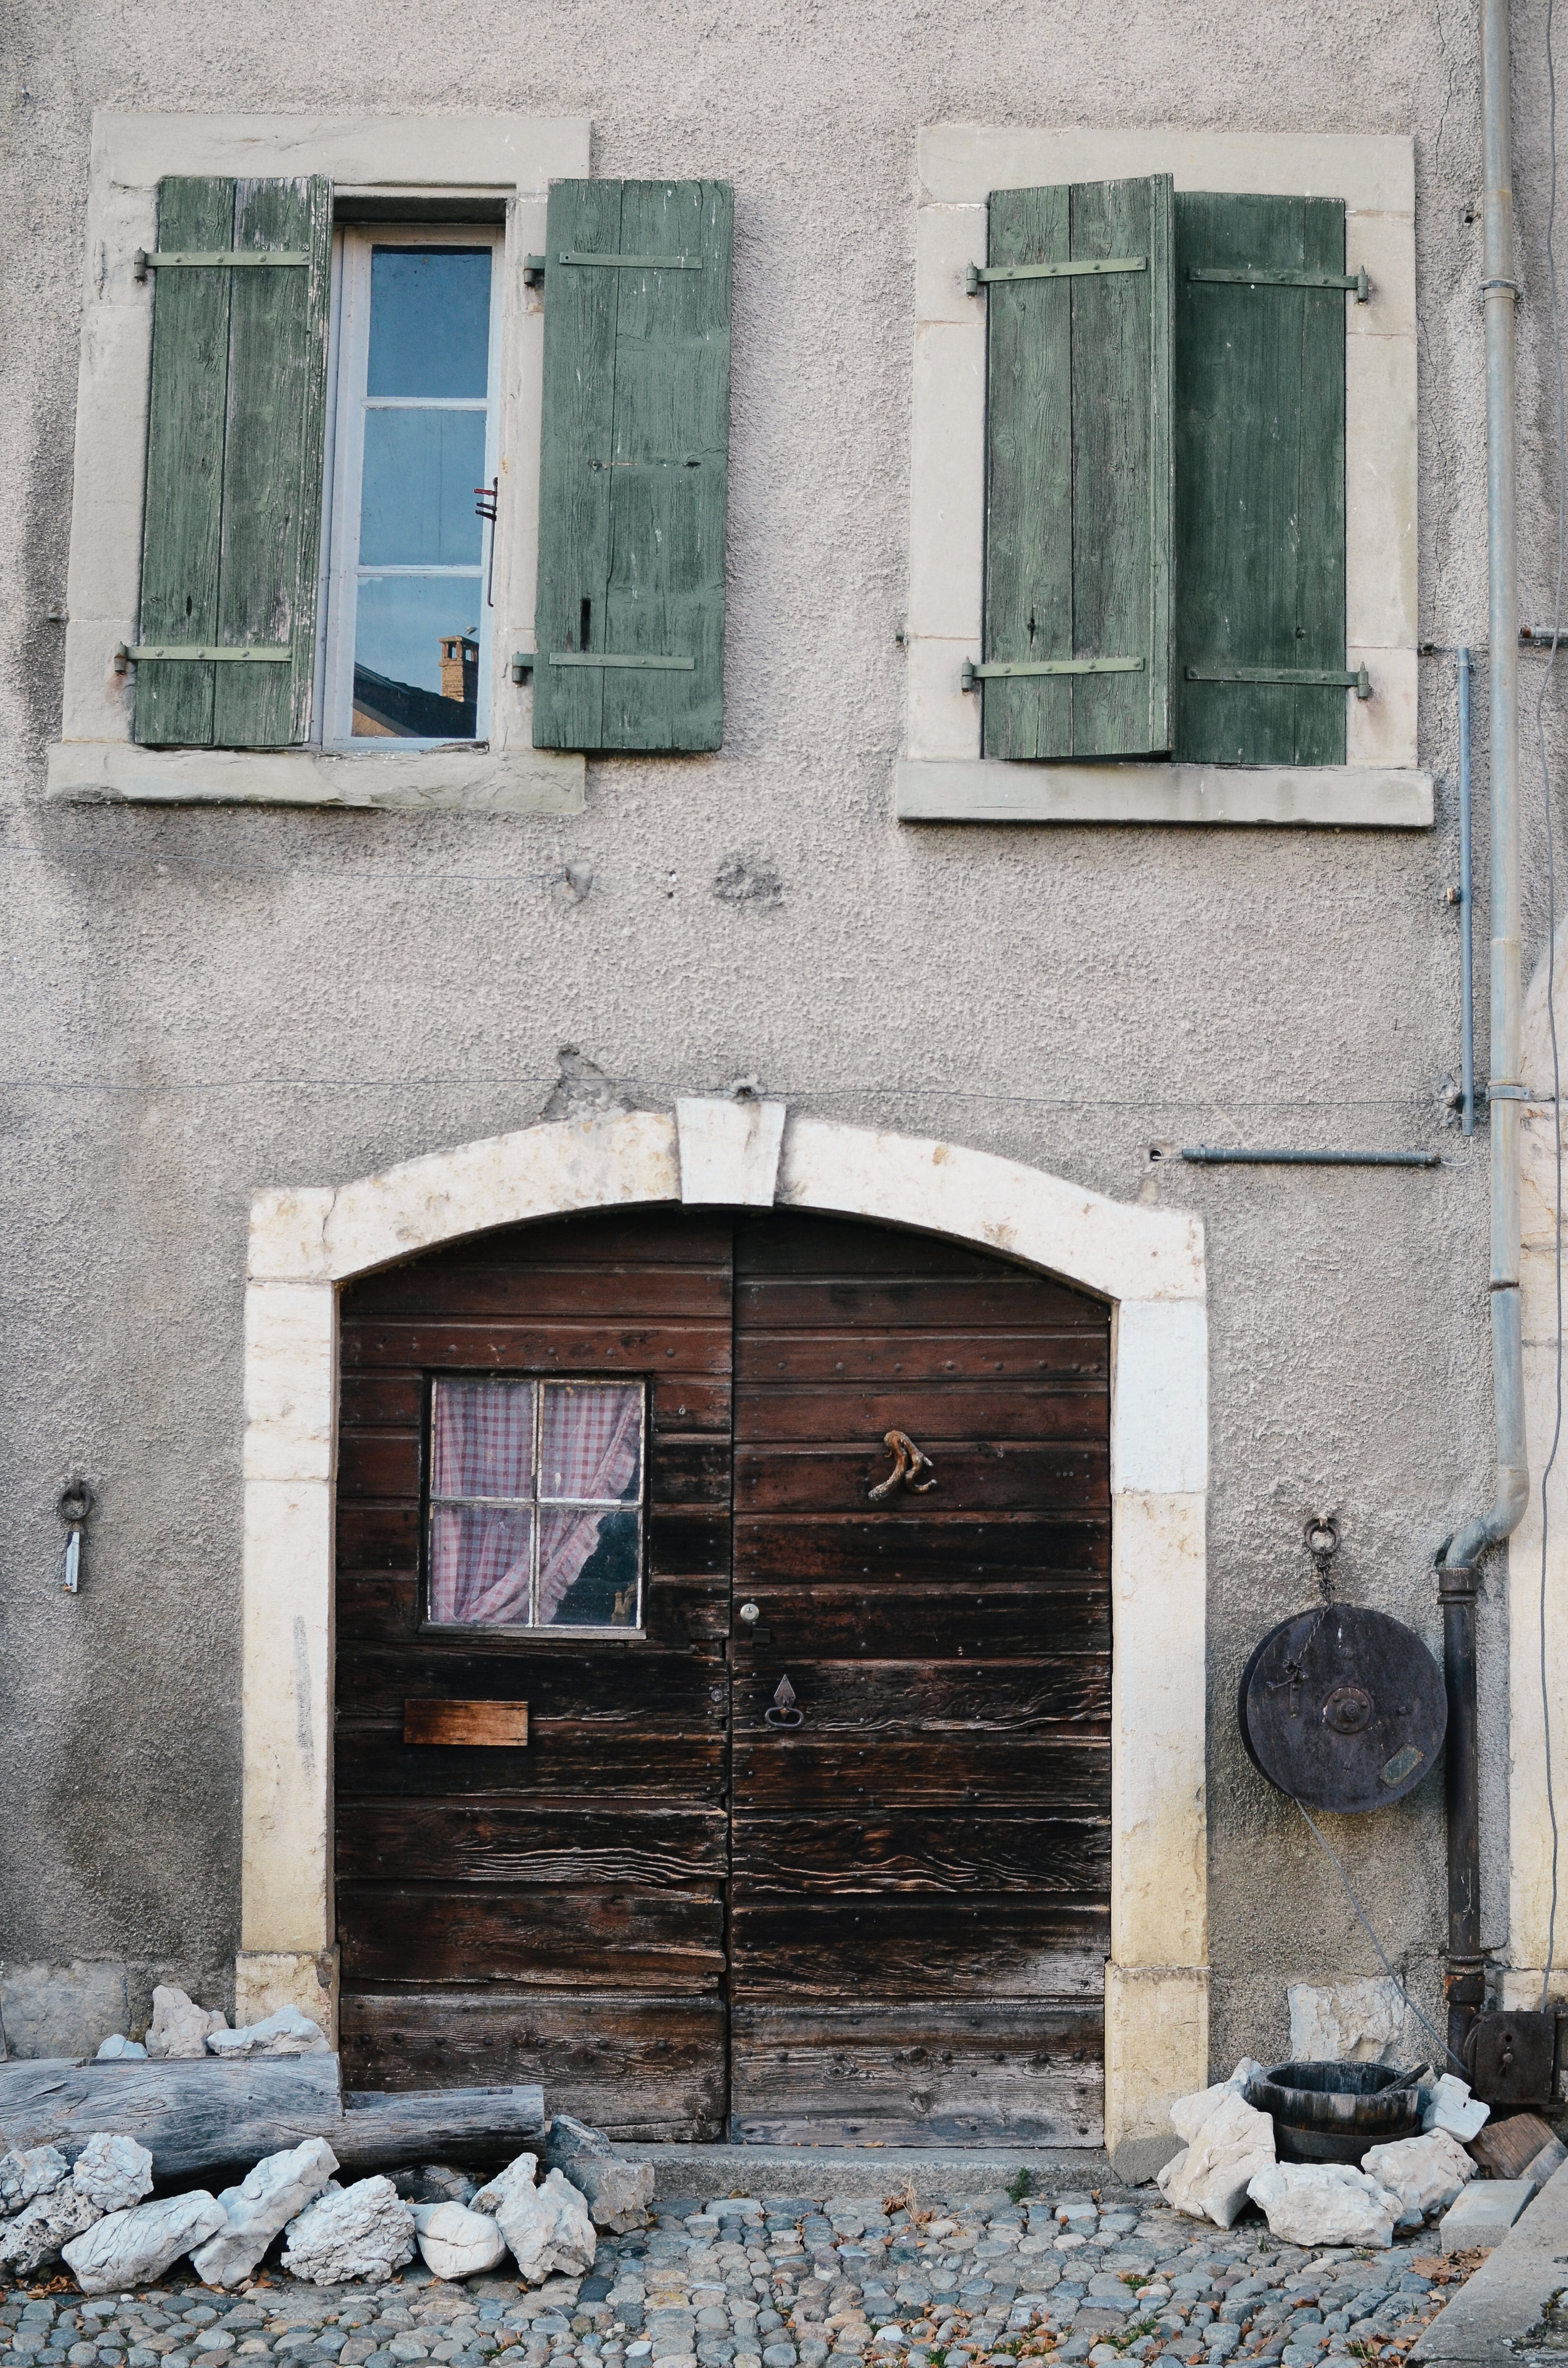 walls-of-switzerland-lifeonpine_DSC_0891.jpg